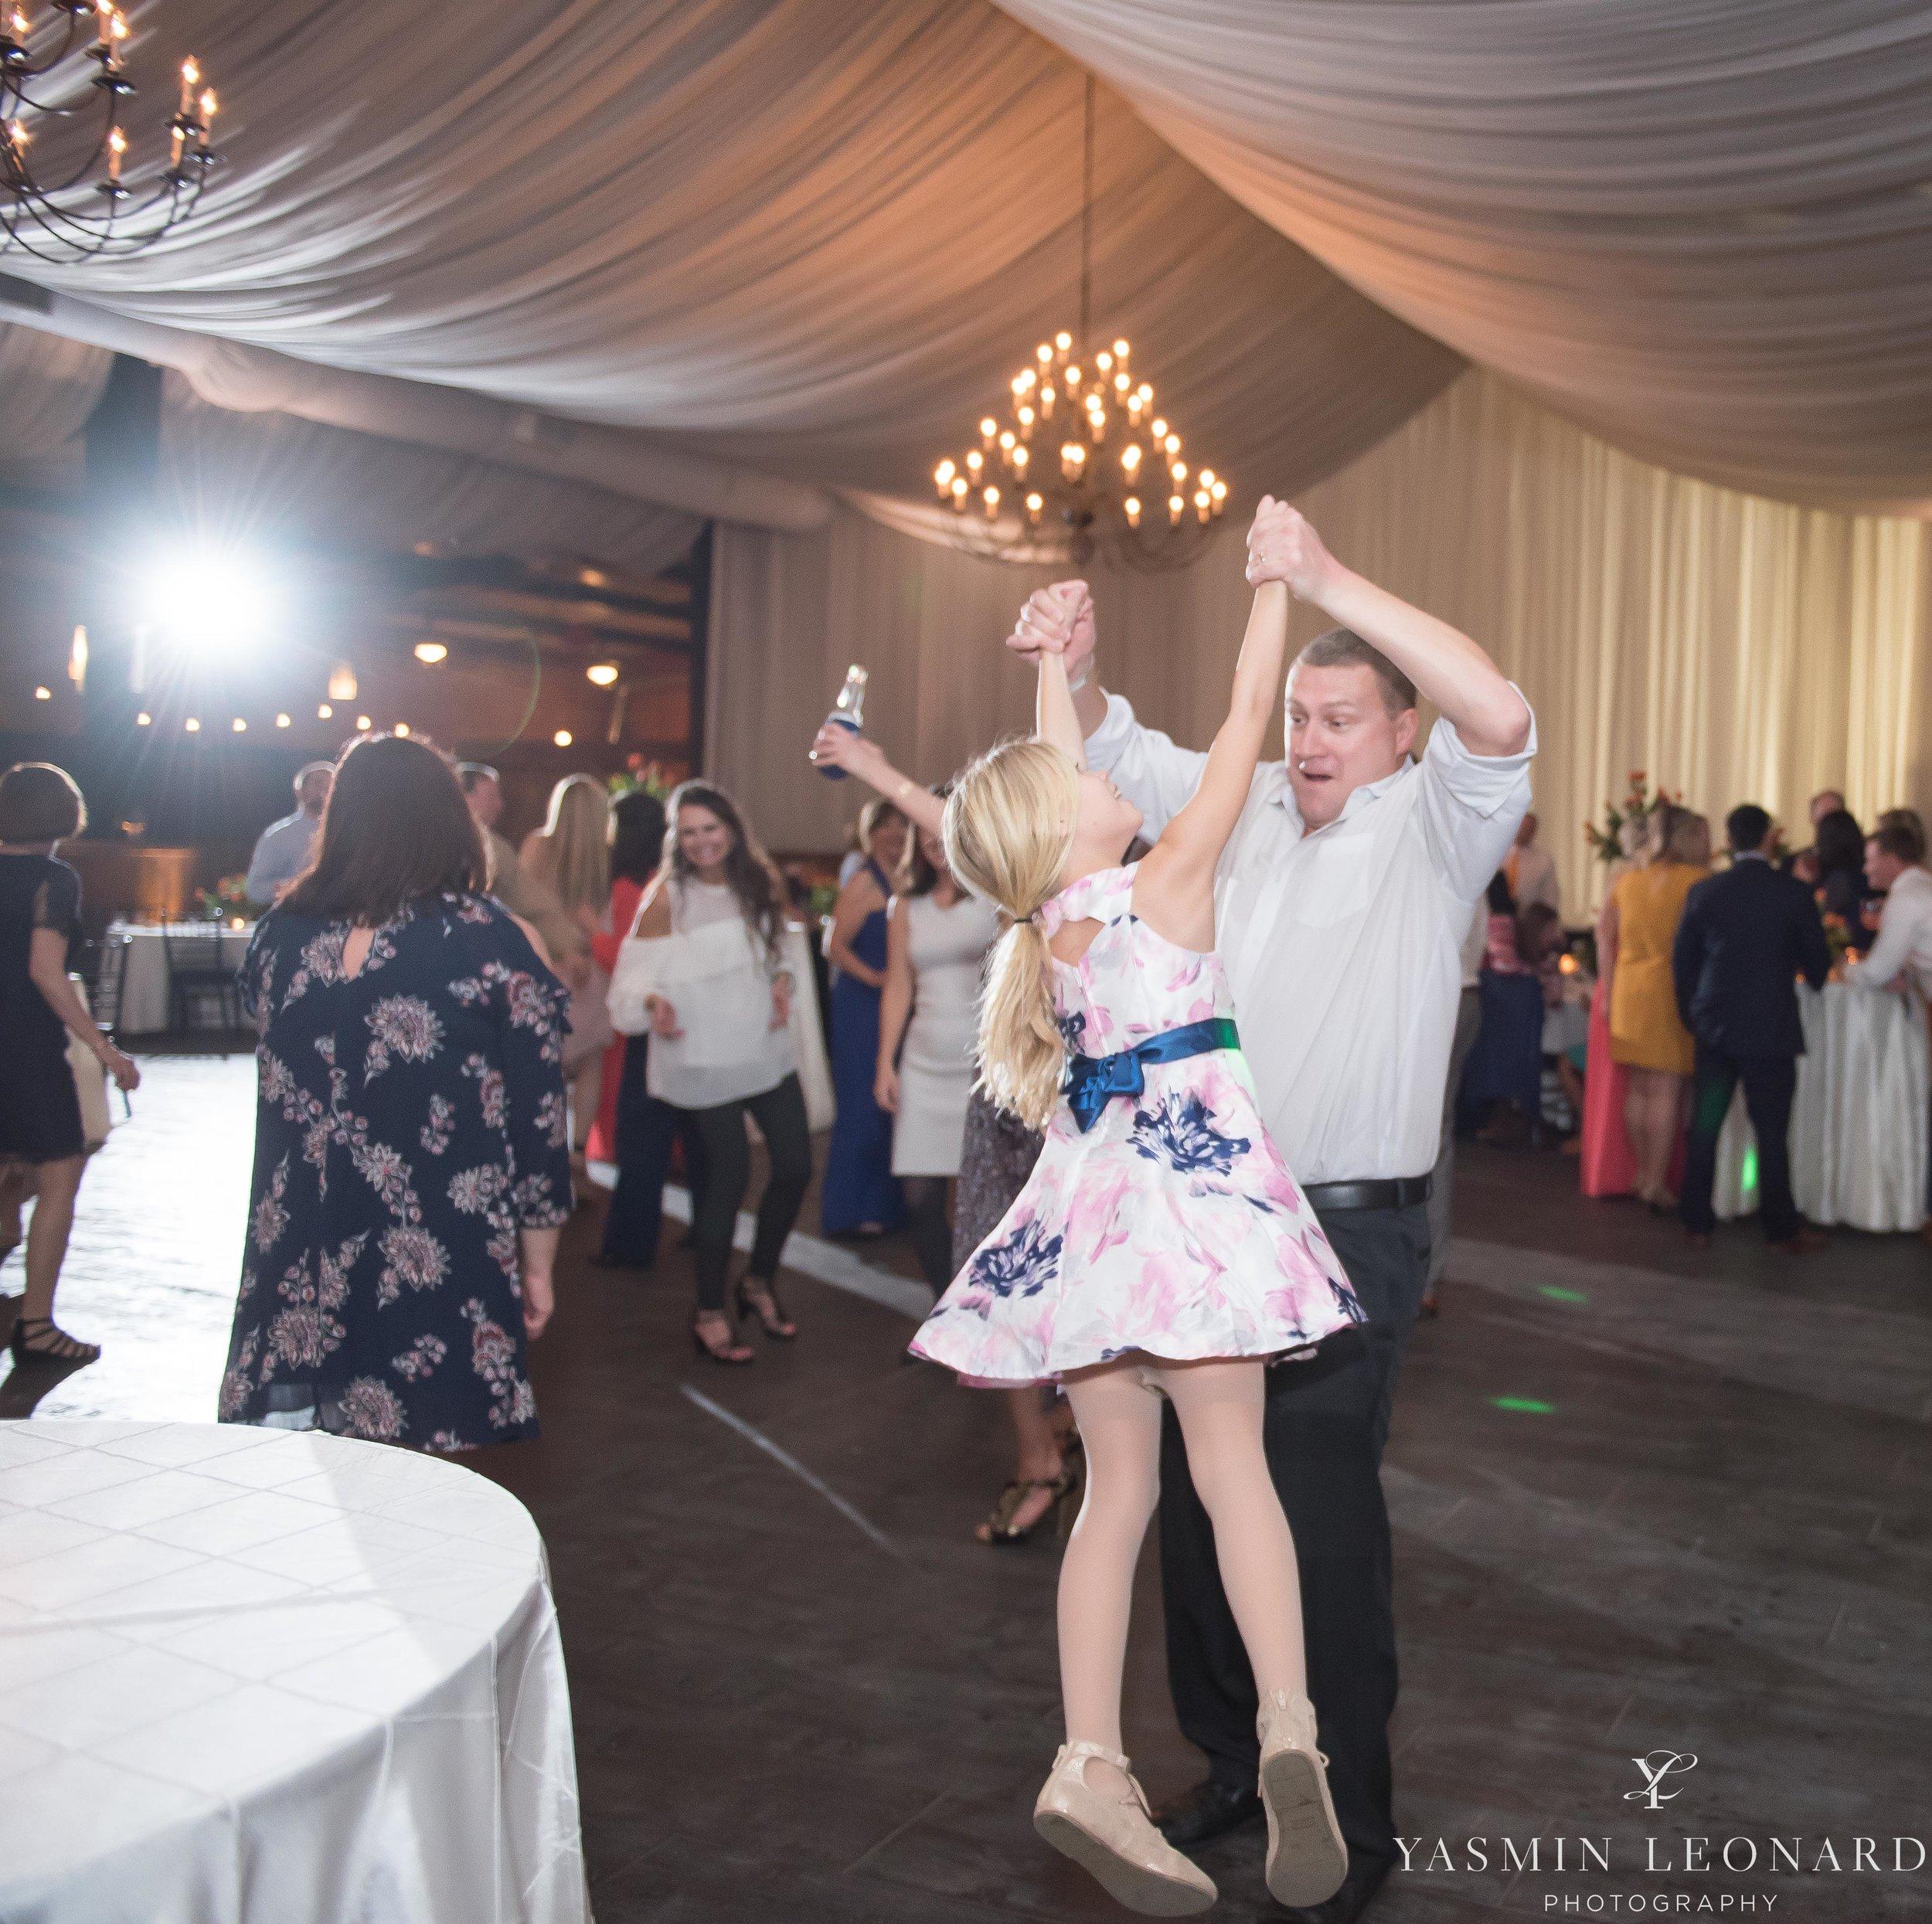 Adaumont Farm - Adaumont Farm Weddings - Trinity Weddings - NC Weddings - Yasmin Leonard Photography-78.jpg